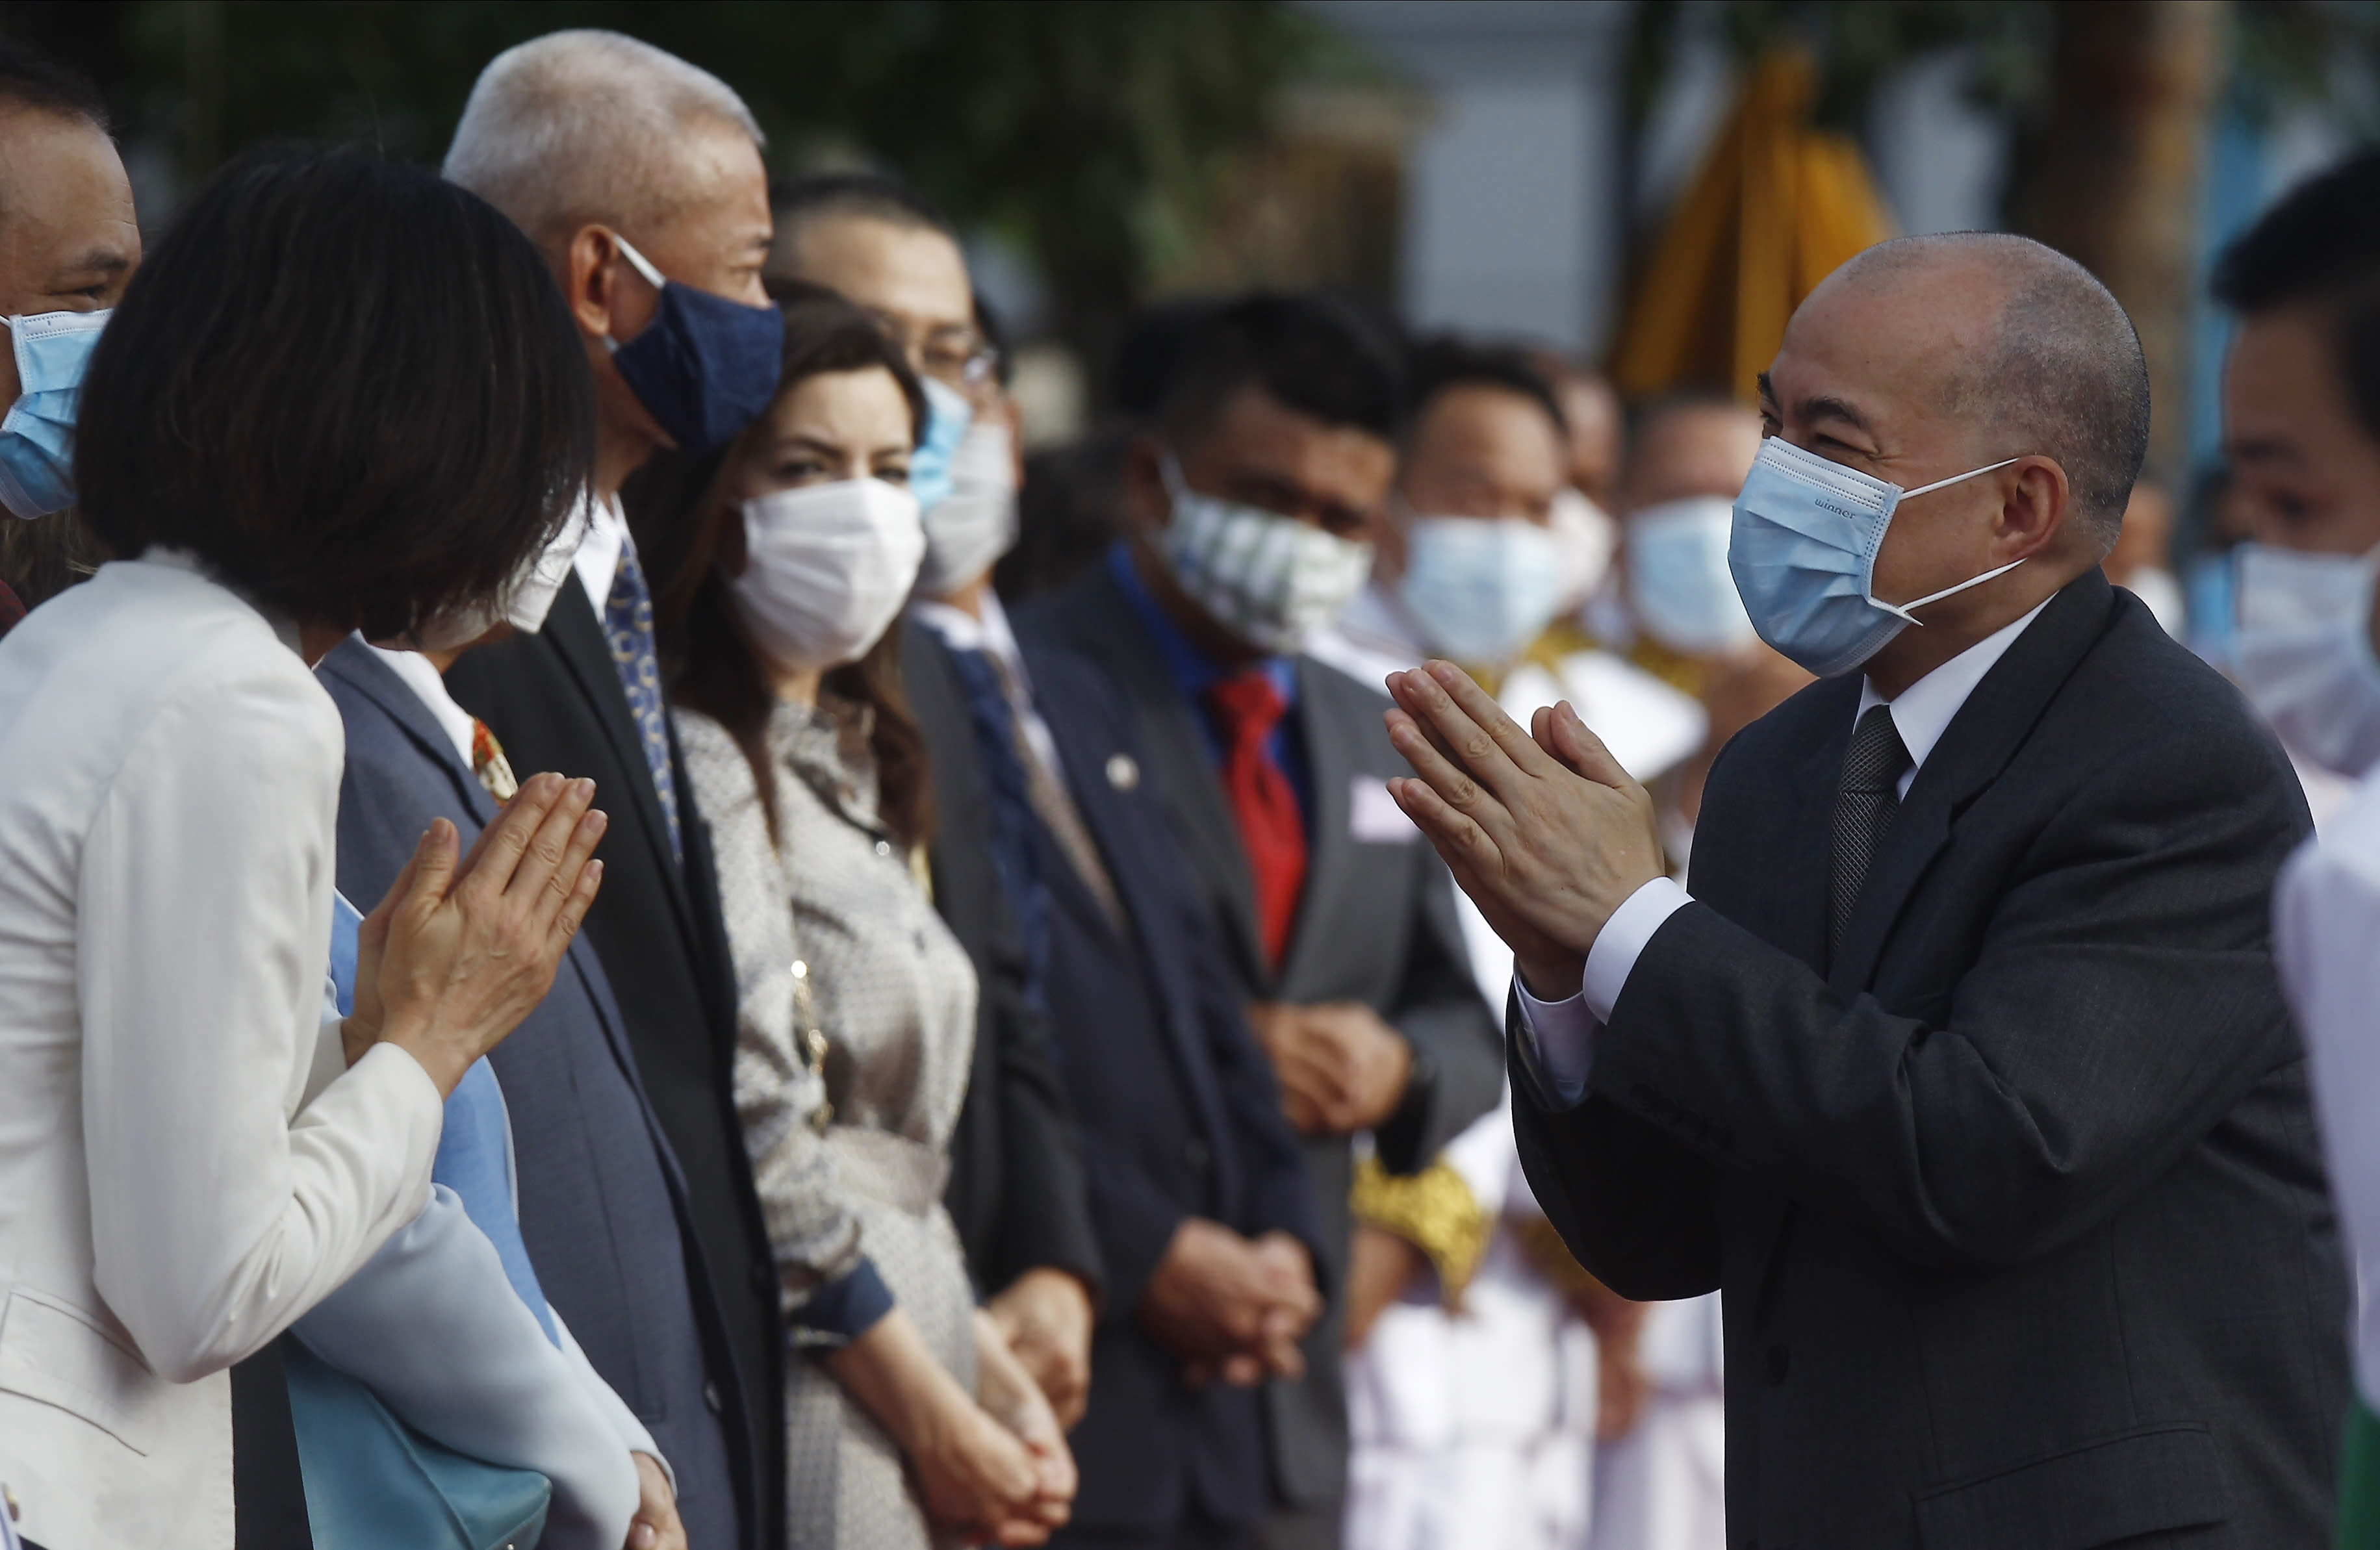 Cambodia's new virus rules restrain holiday celebrations